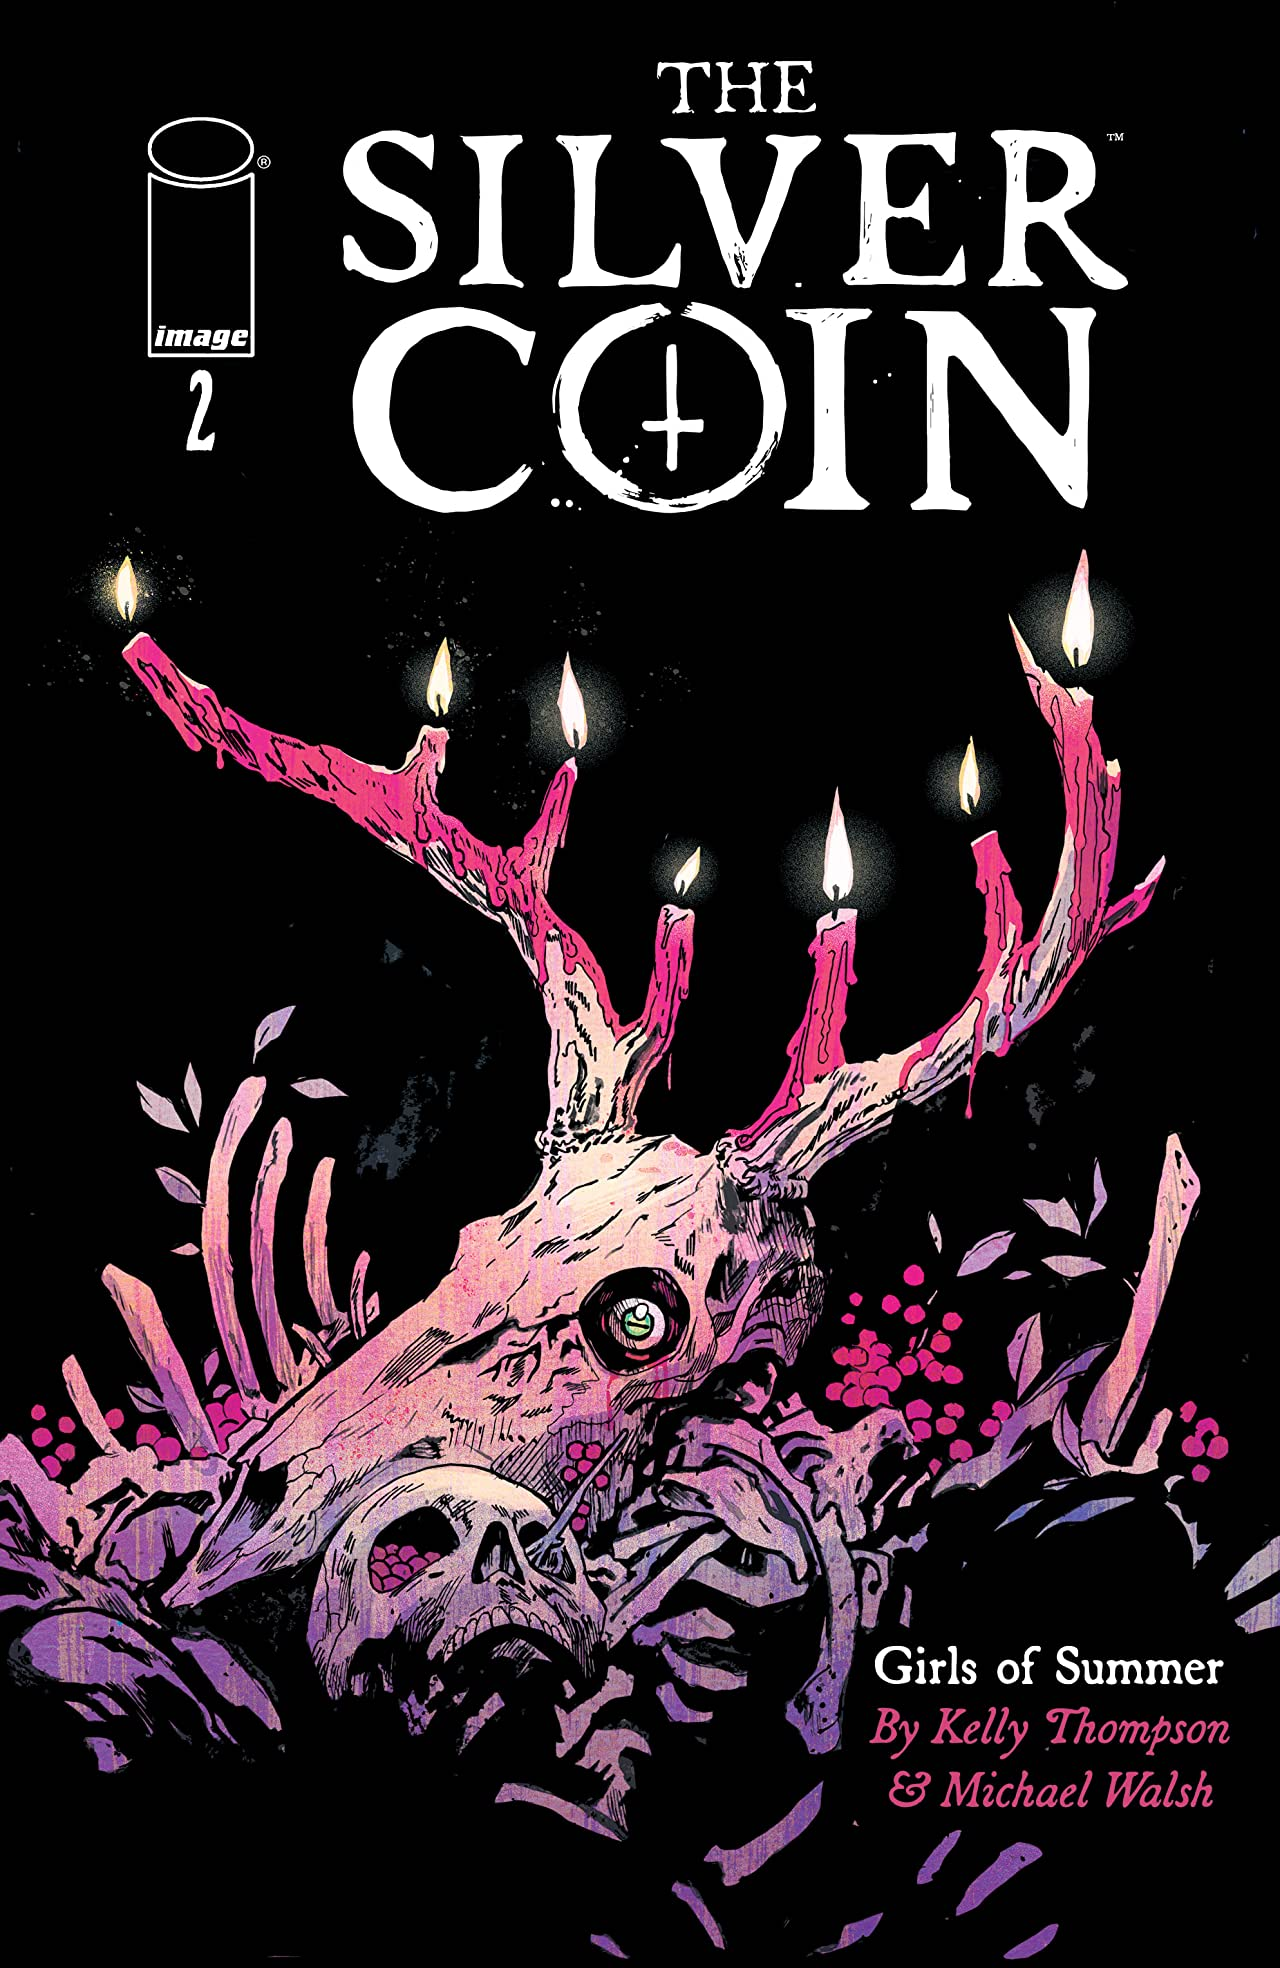 The Silver Coin #2